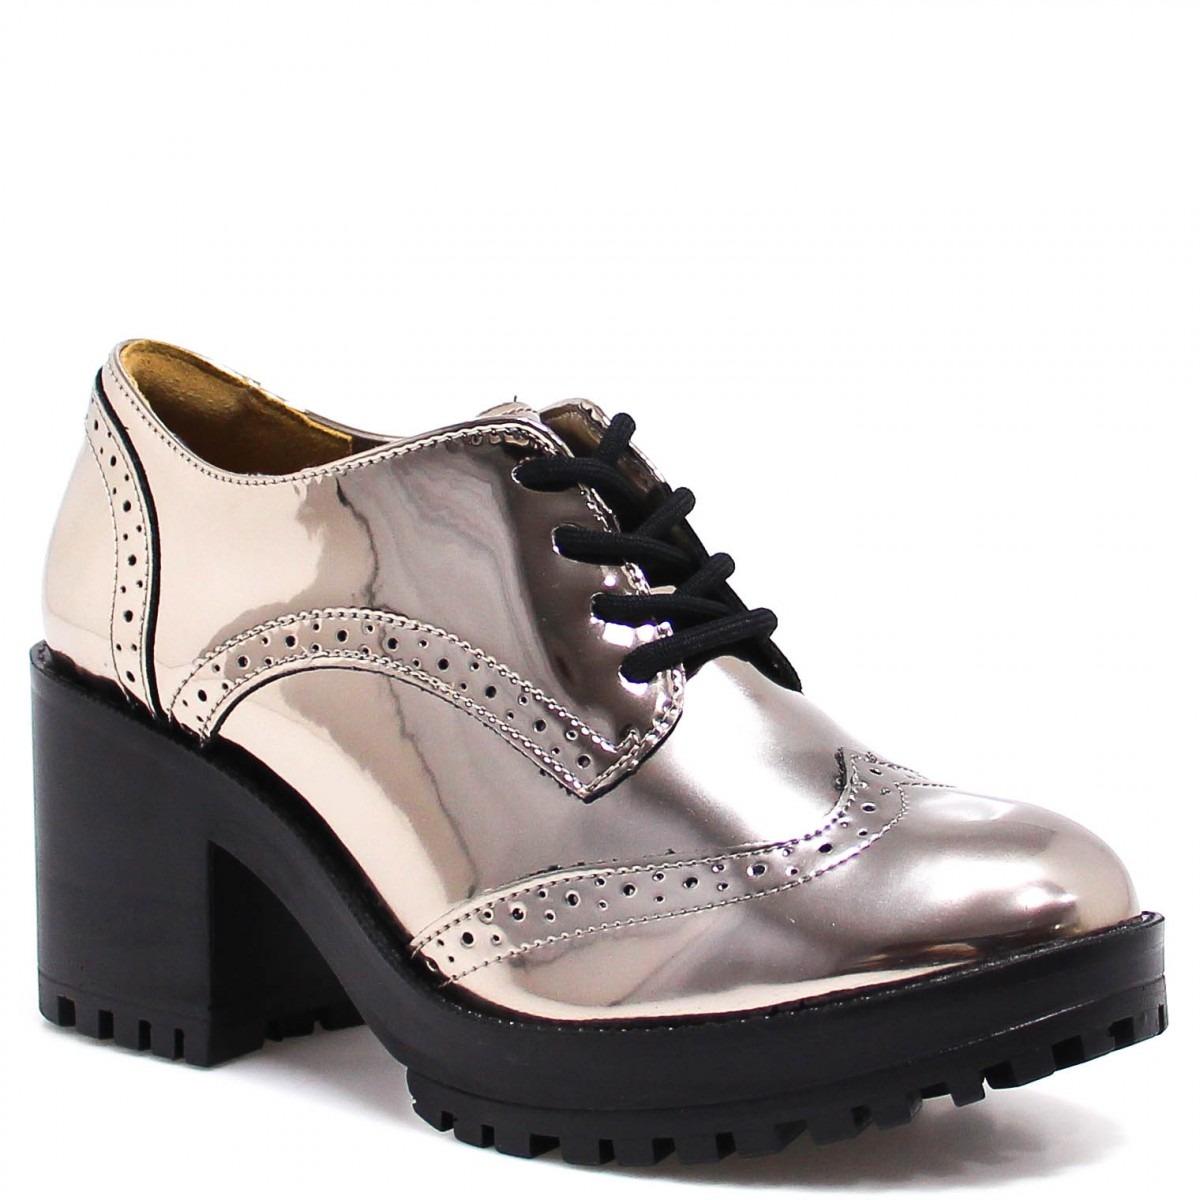 3c8acfd47 sapato feminino oxford via marte verniz salto bloco | zariff. Carregando  zoom.